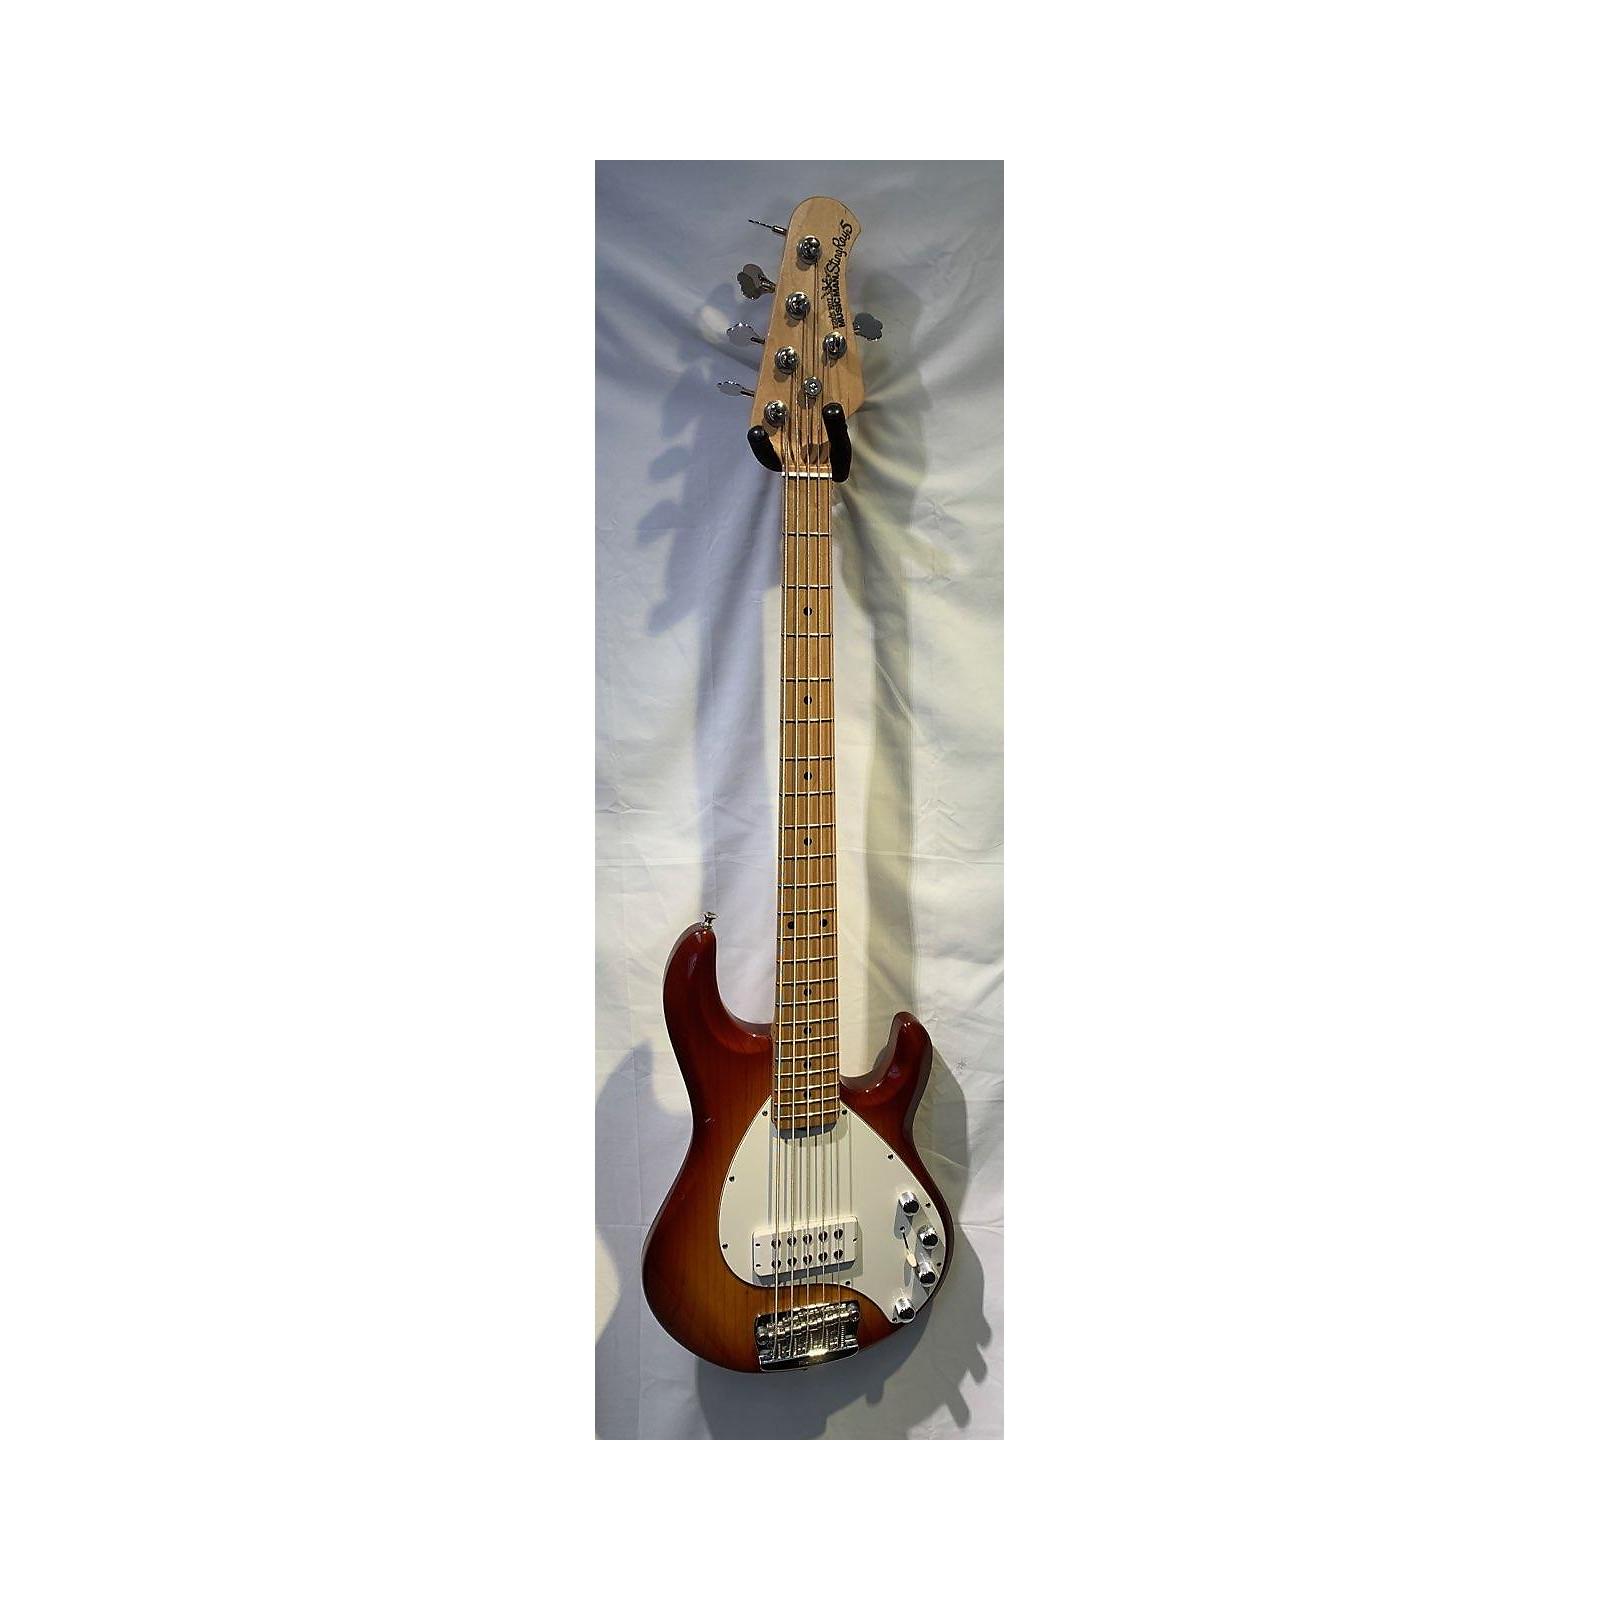 Ernie Ball Music Man Stingray 5 H Electric Bass Guitar